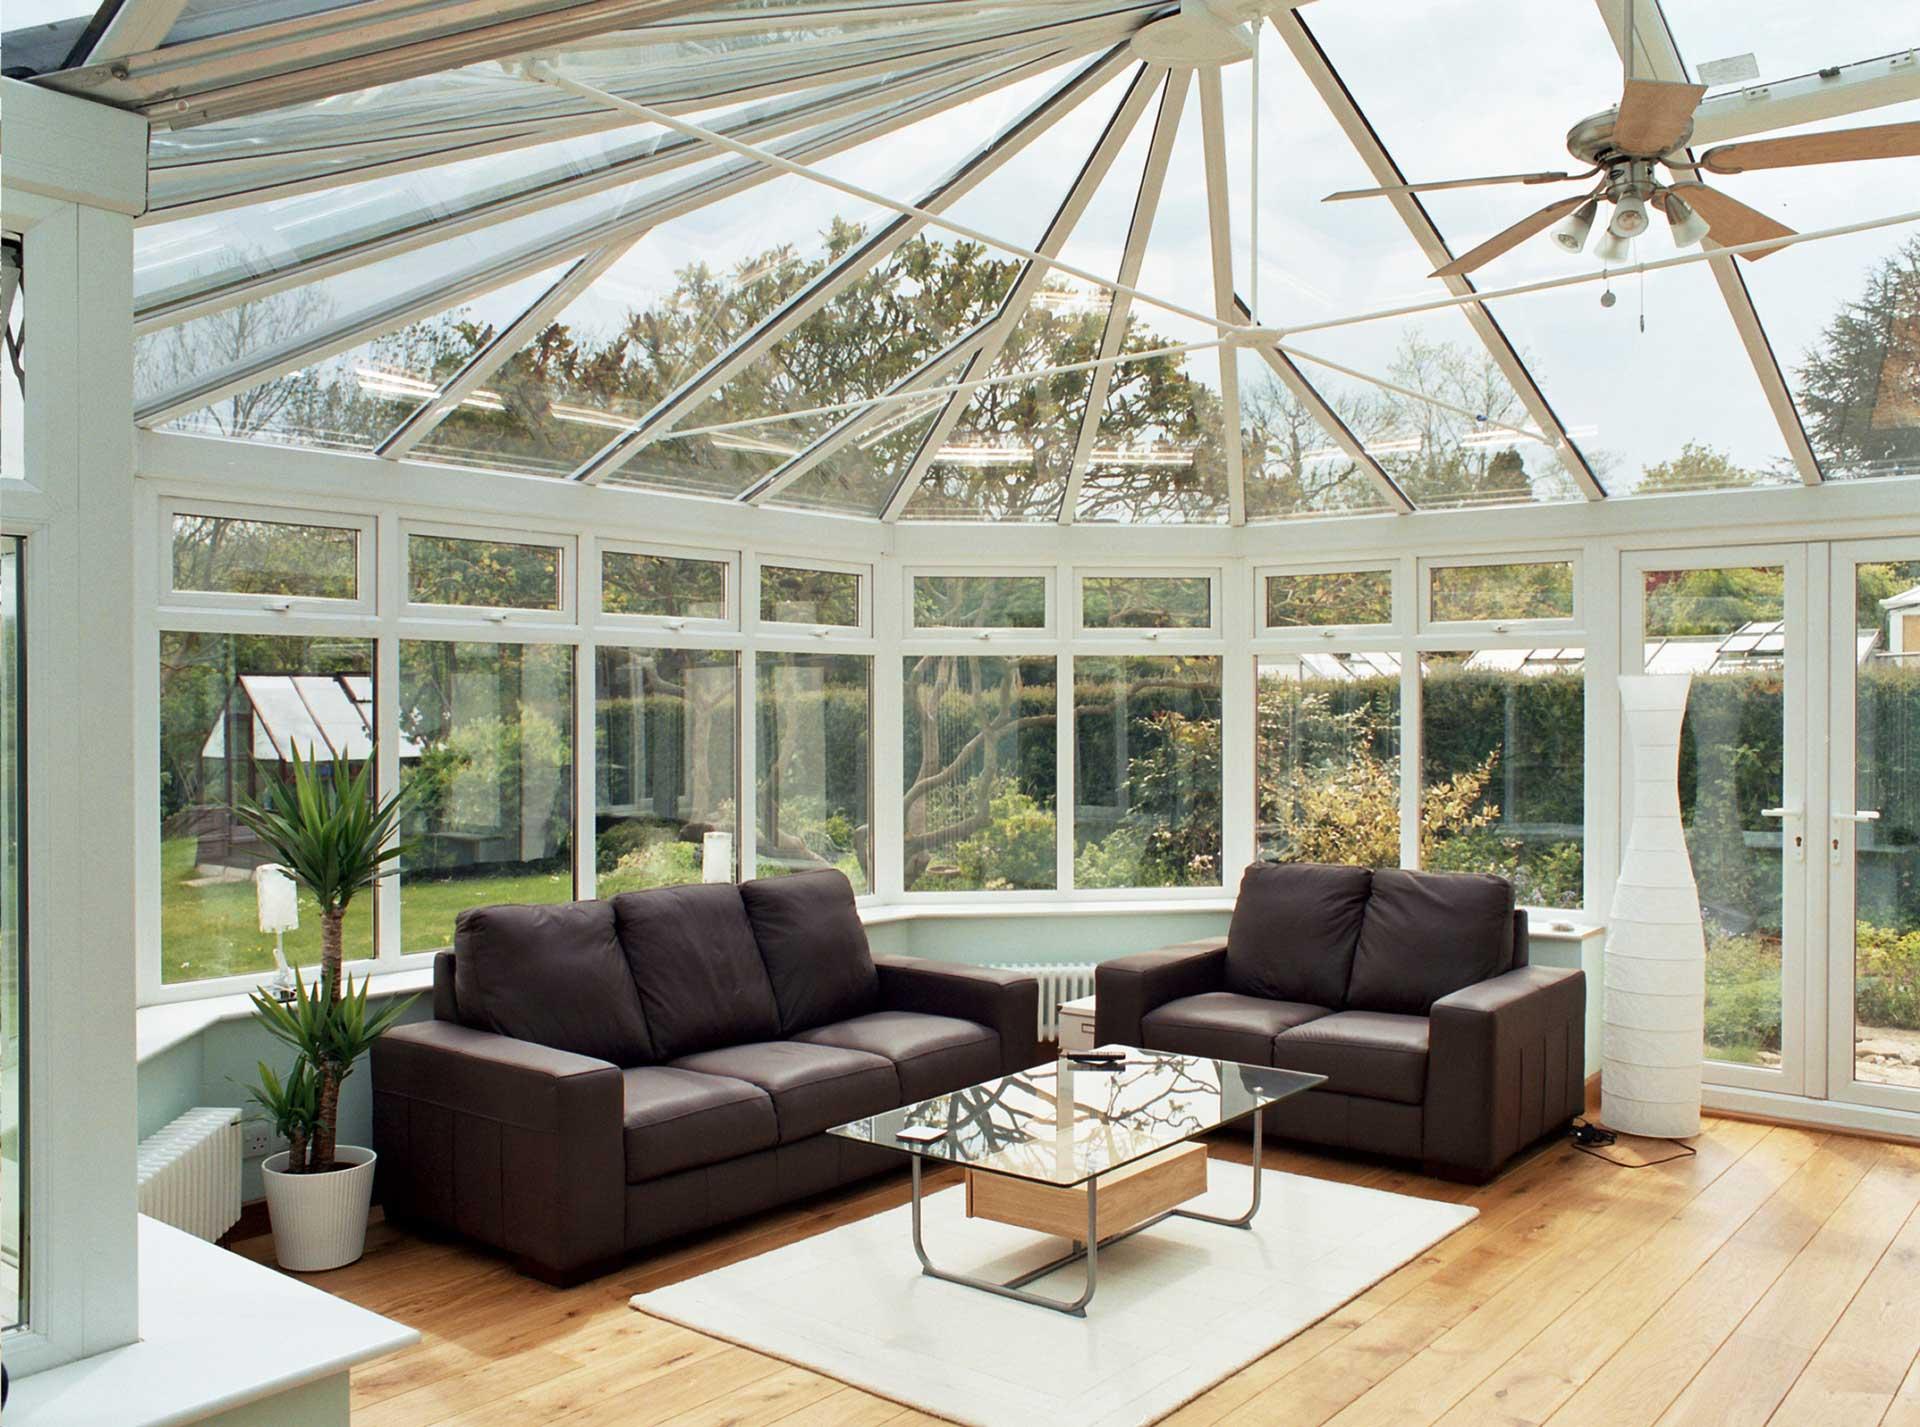 Conservatory Prices Startford-upon-Avon